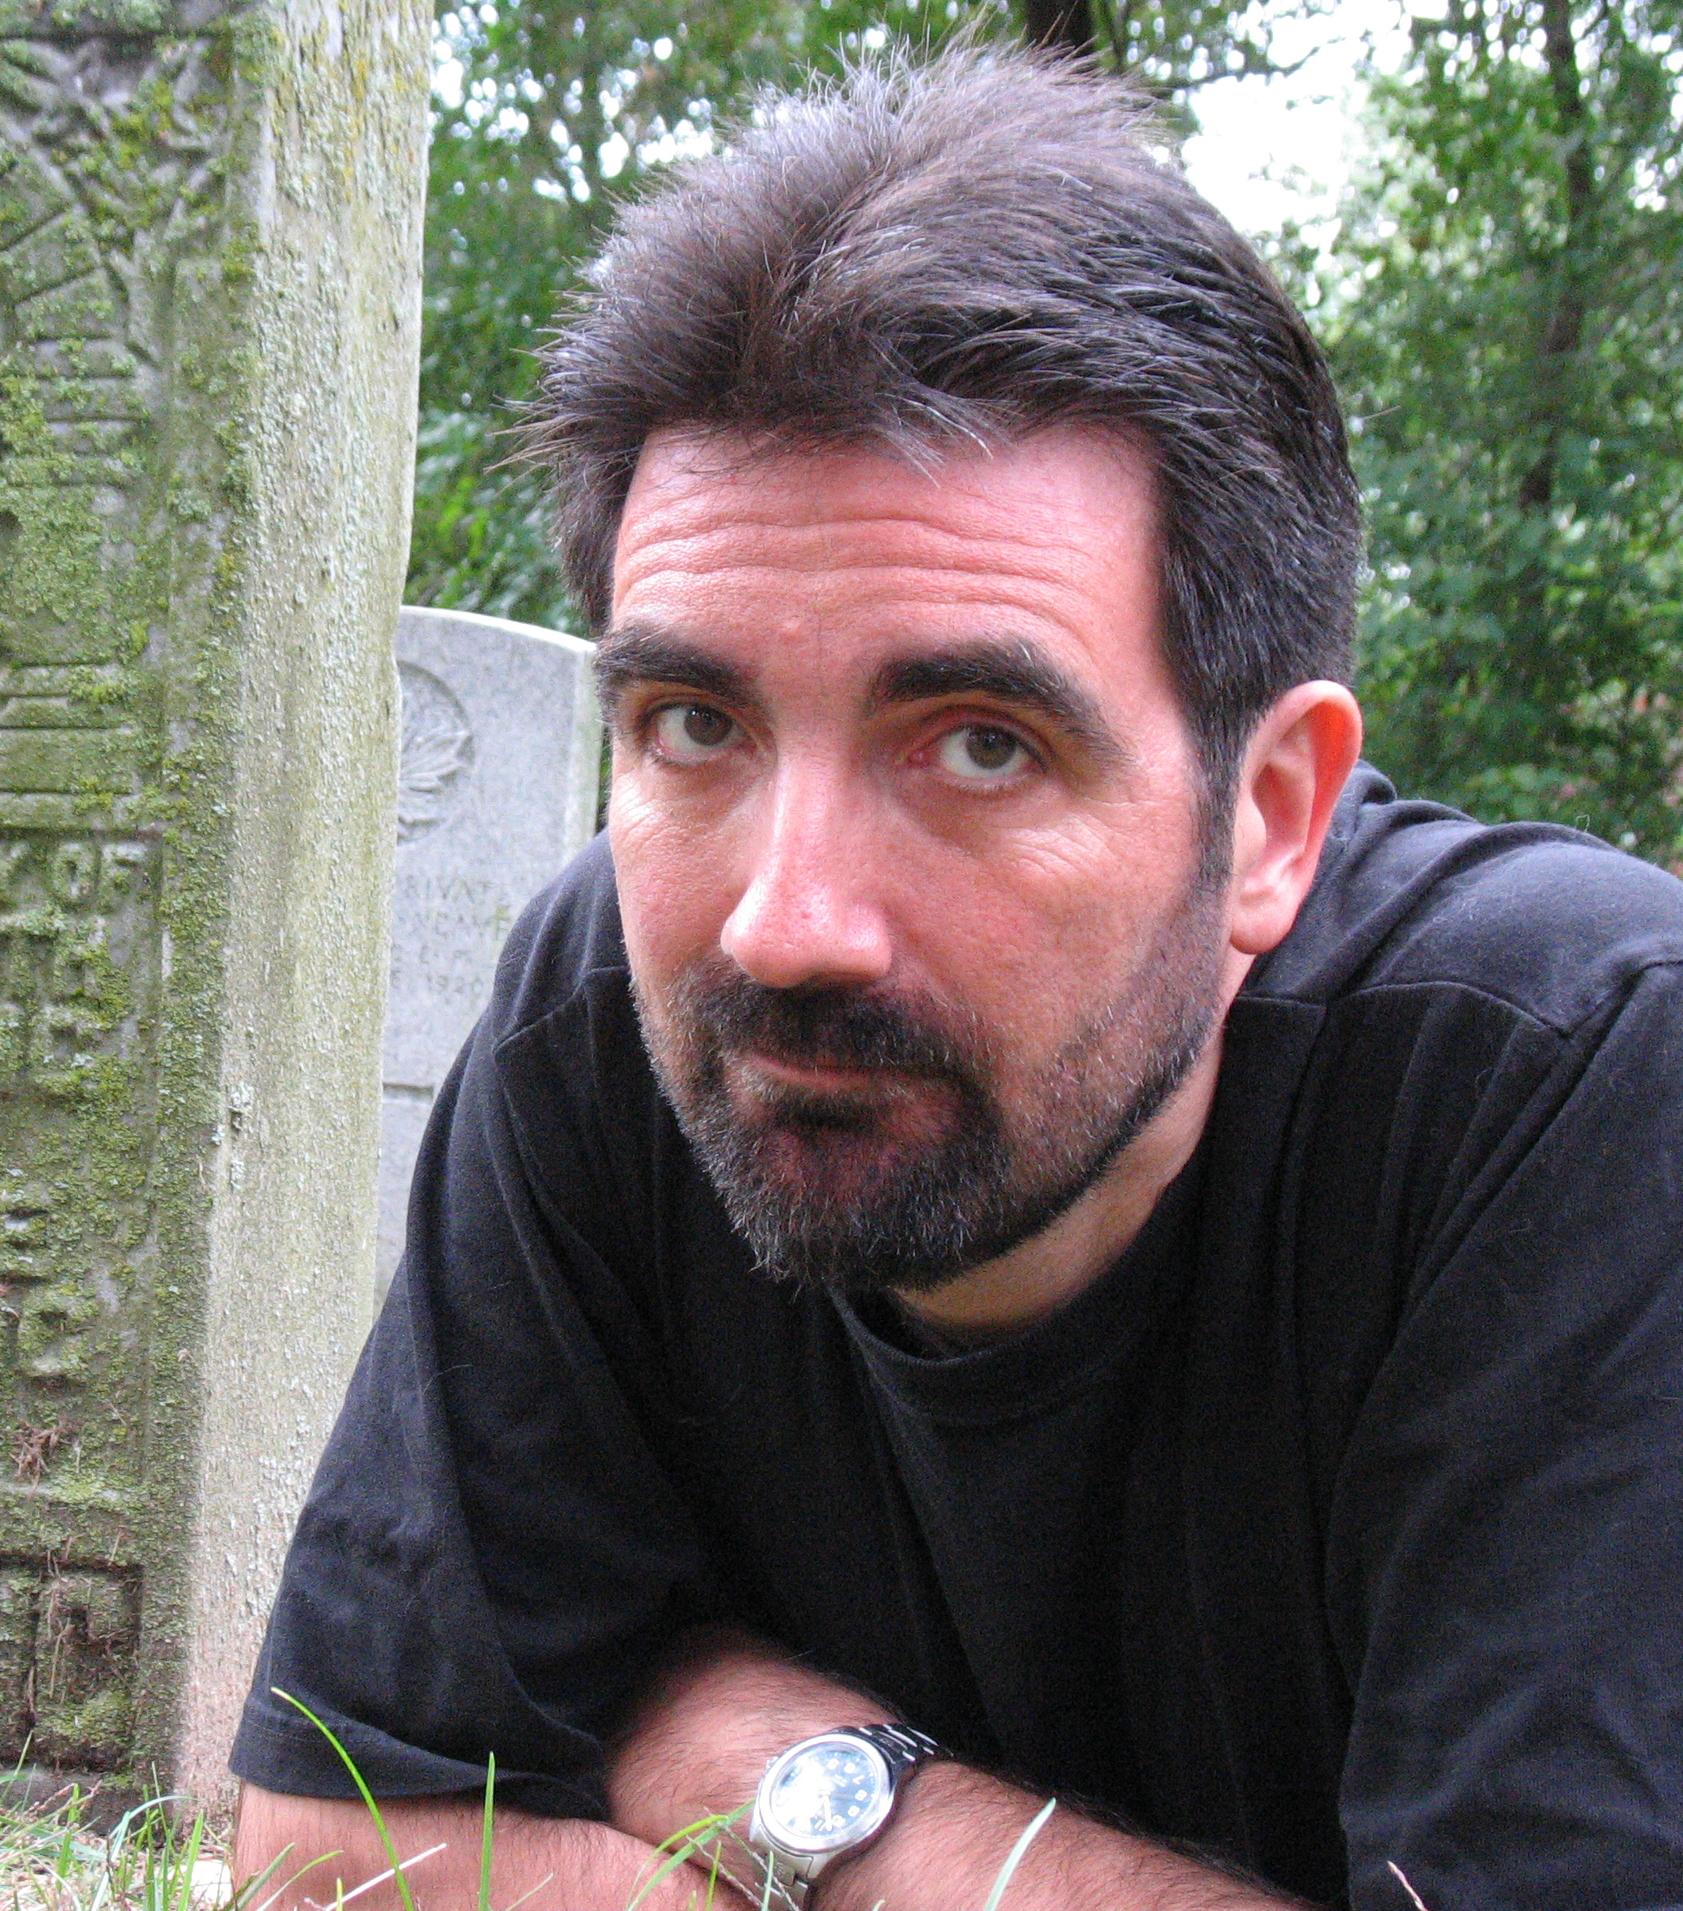 Author photo courtesy of David Nickle